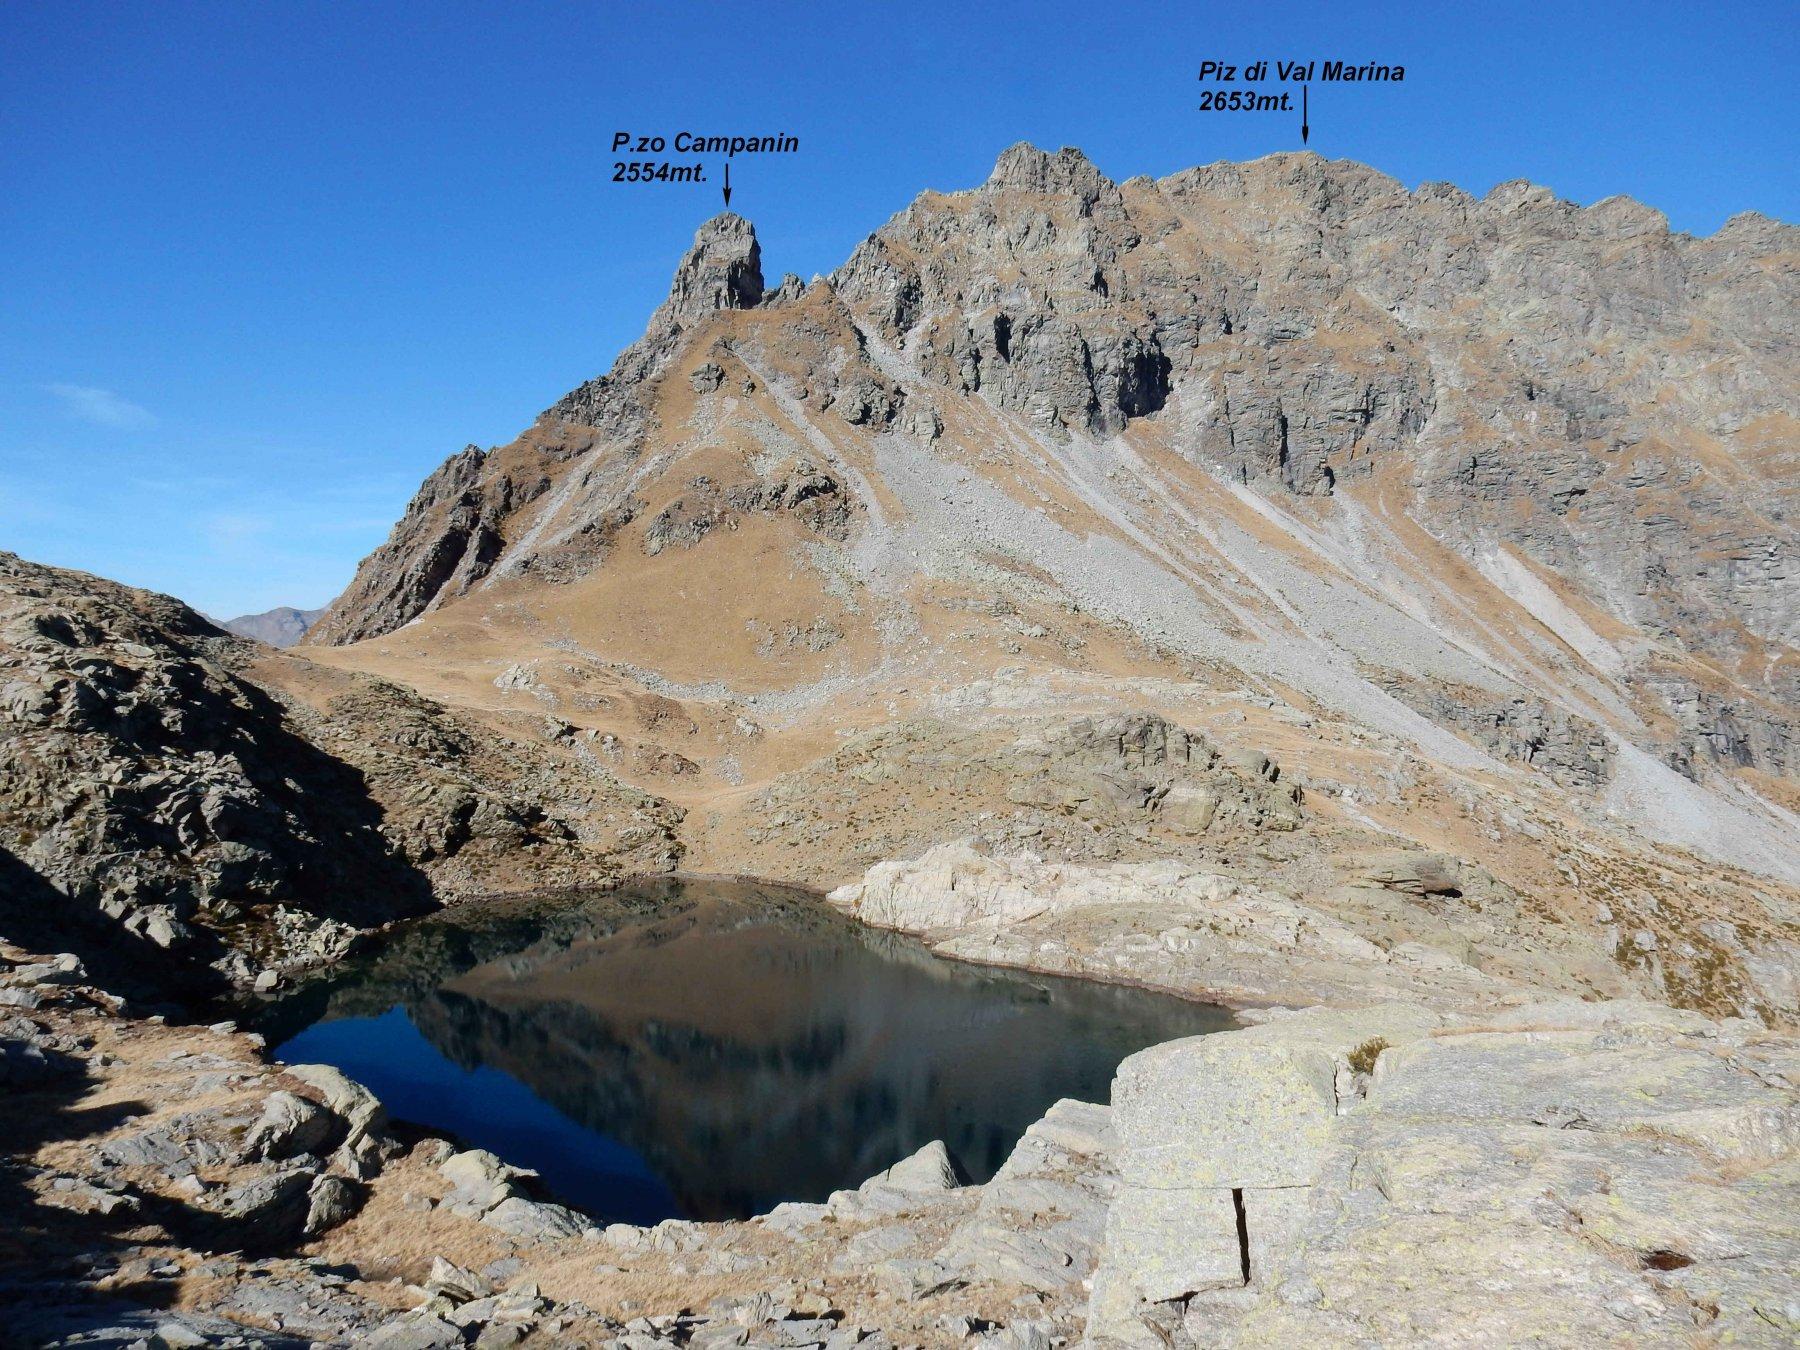 Lago di Caprara 2280mt.